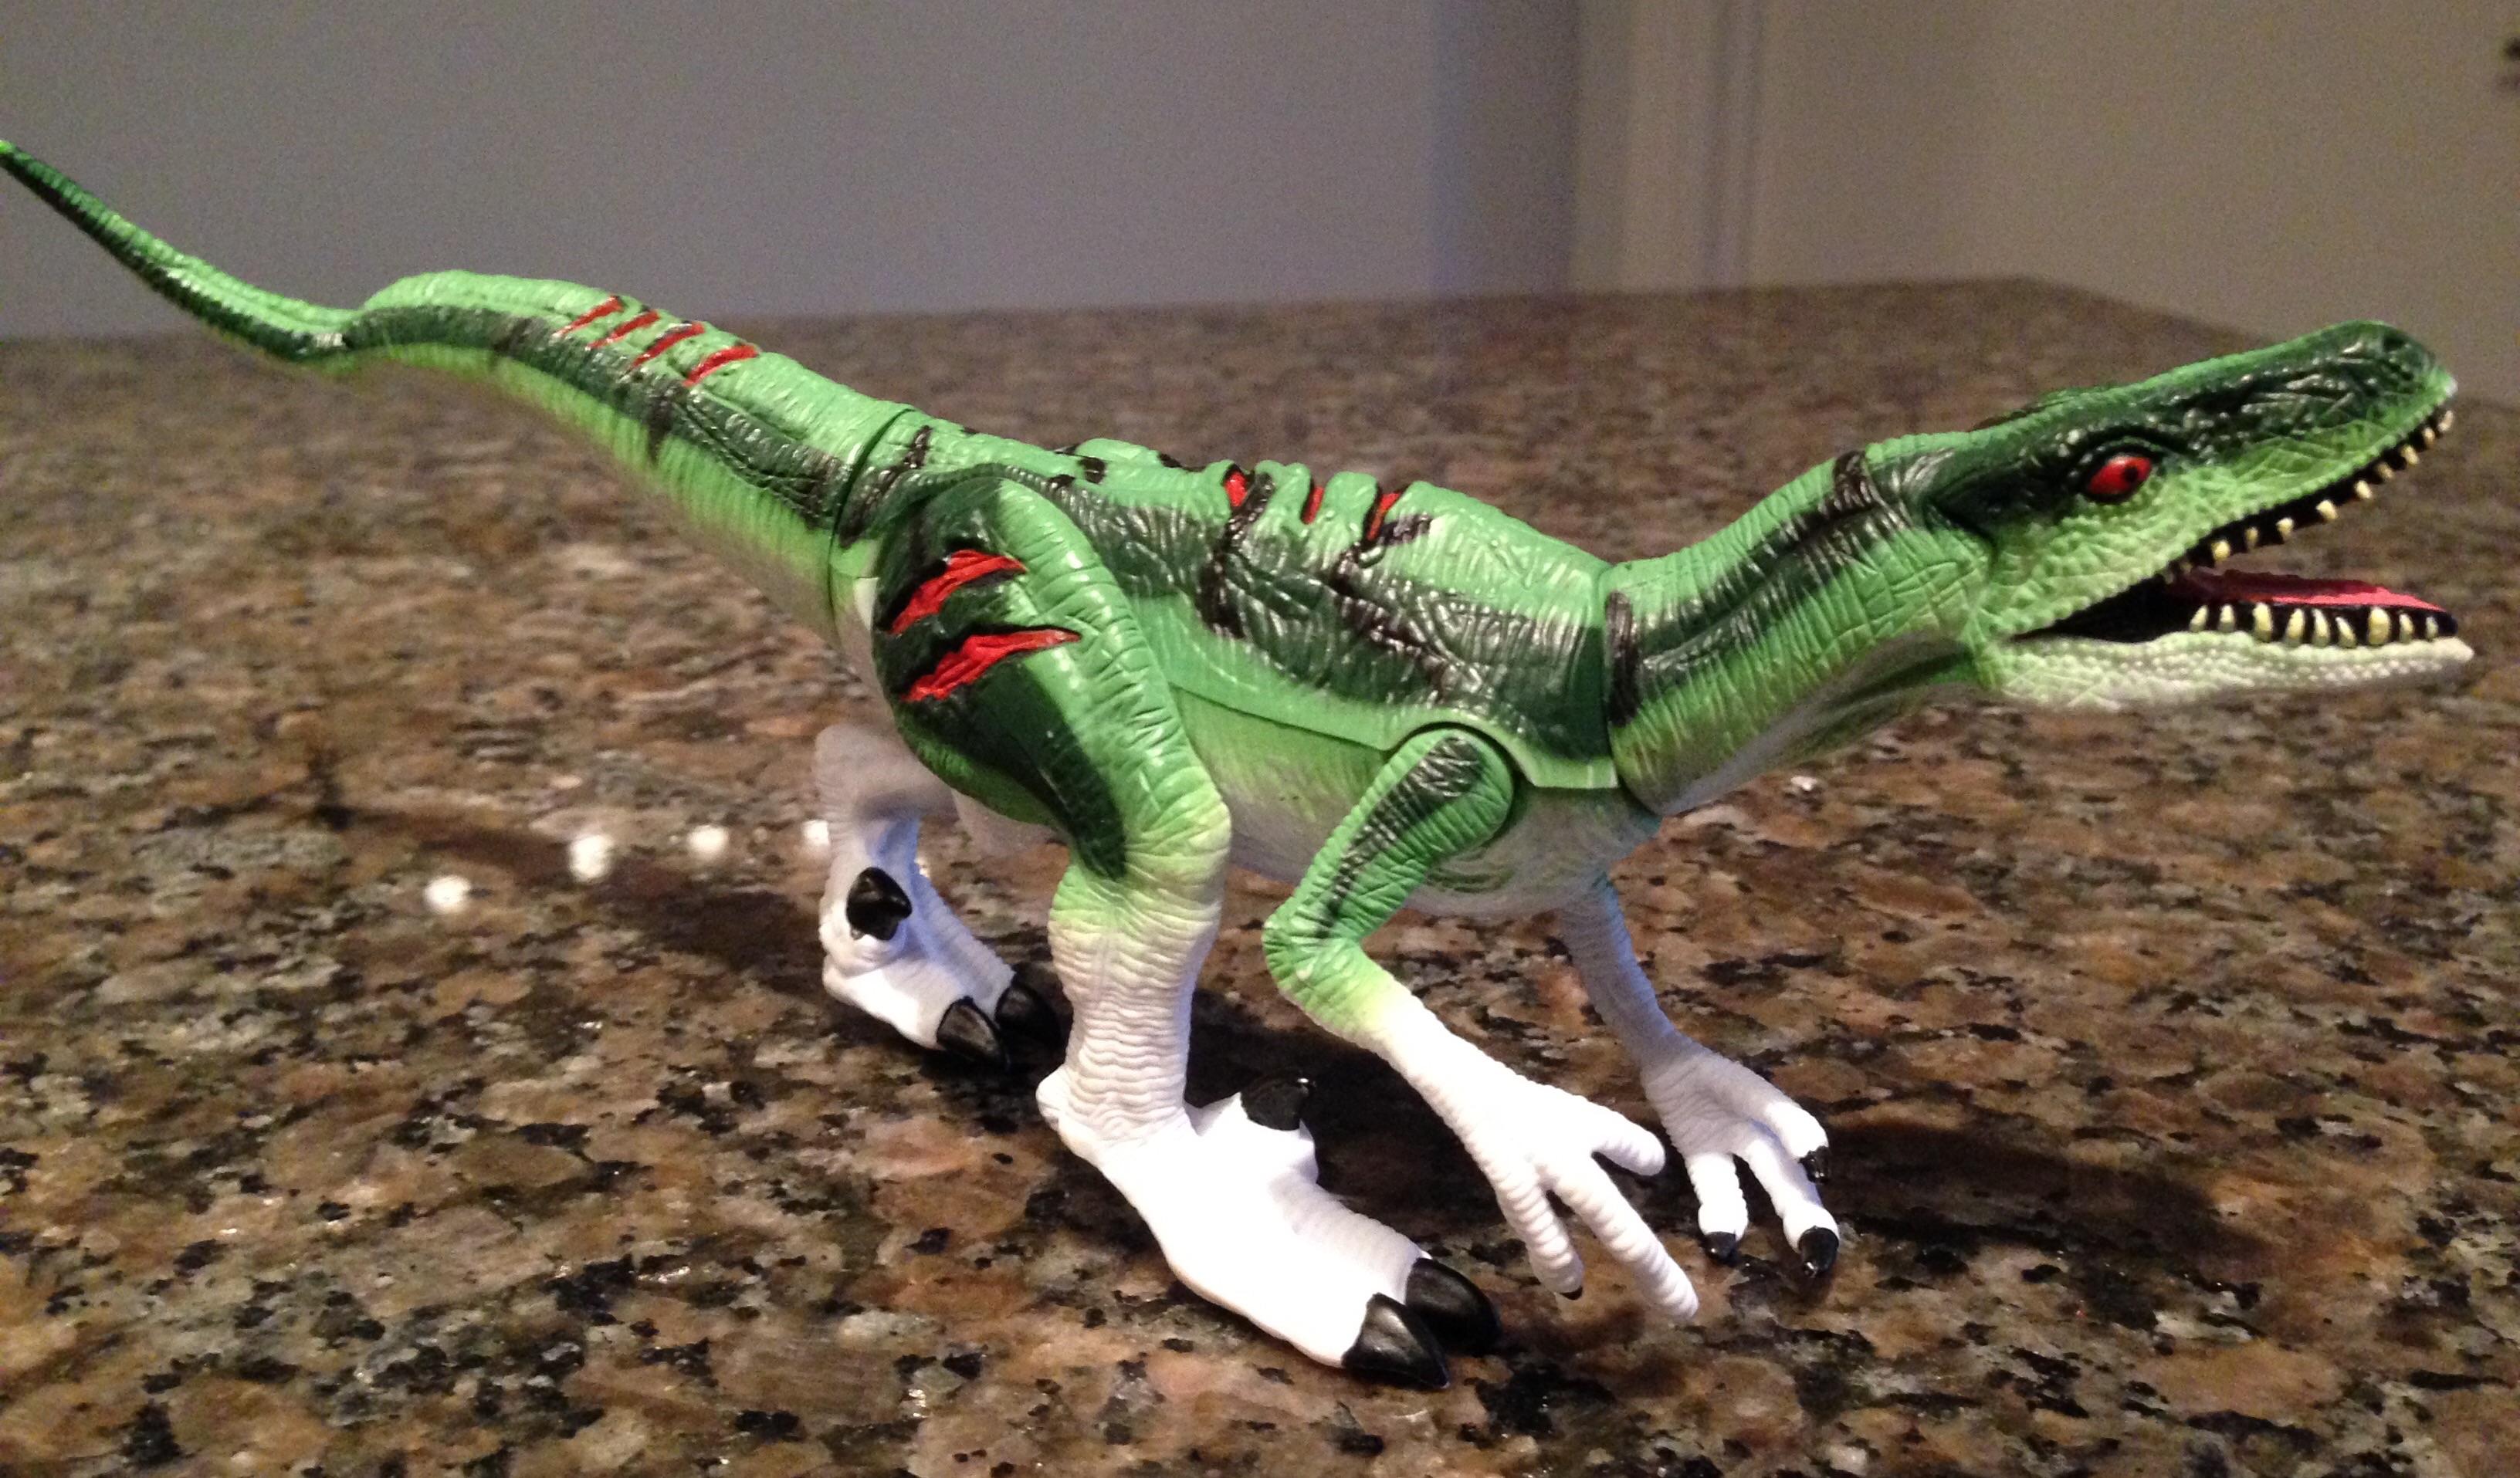 Jurassic park raptor toys theme